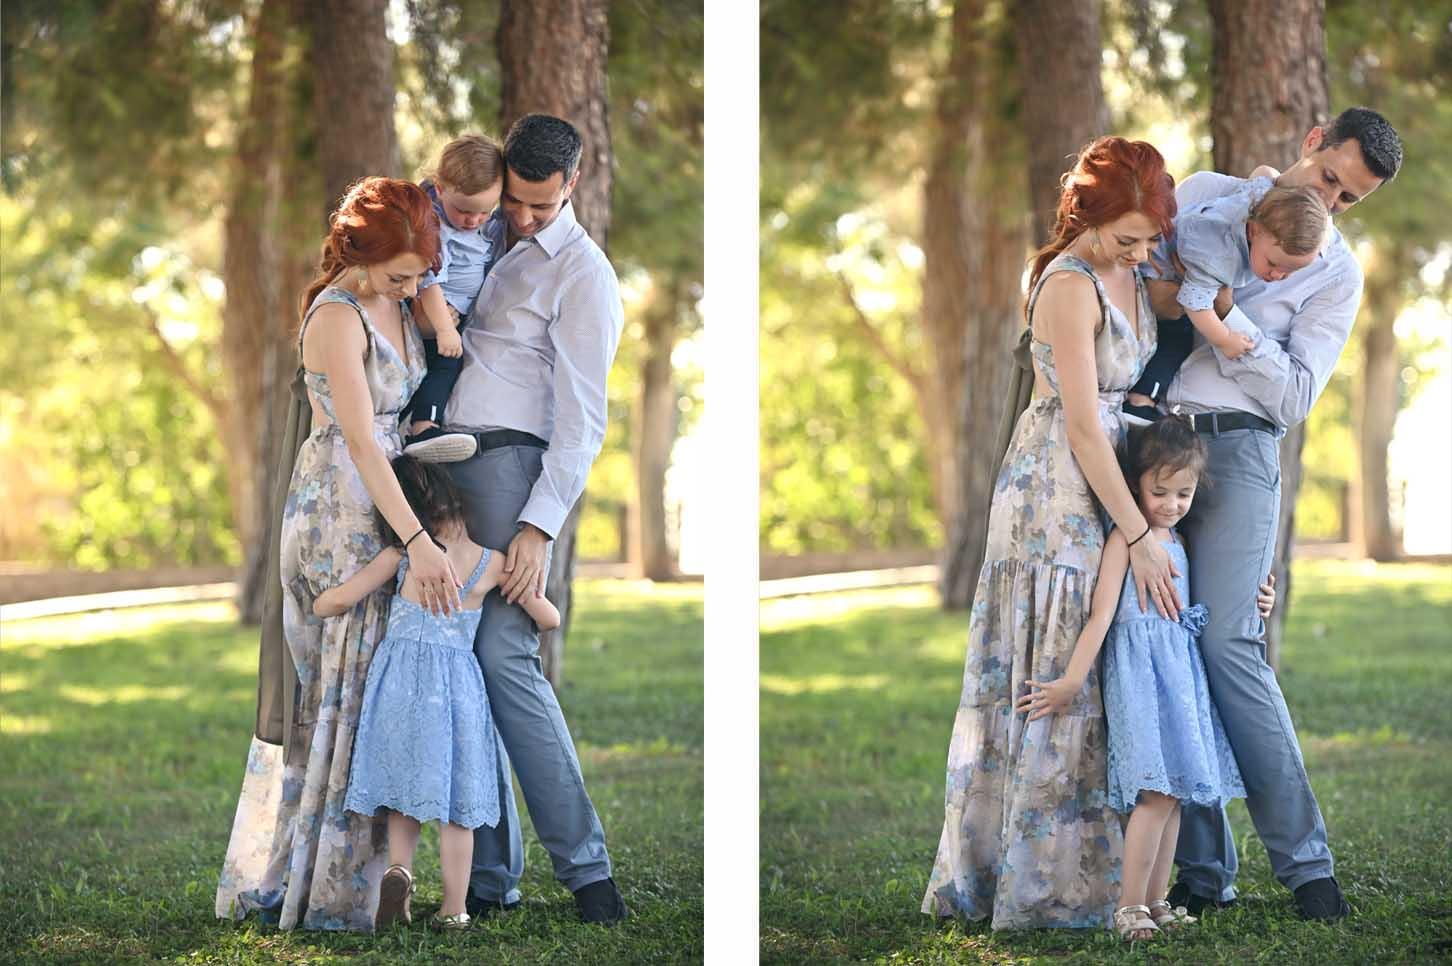 mum-son -family-portraits -l arissa-alexis-koumaditis-photography